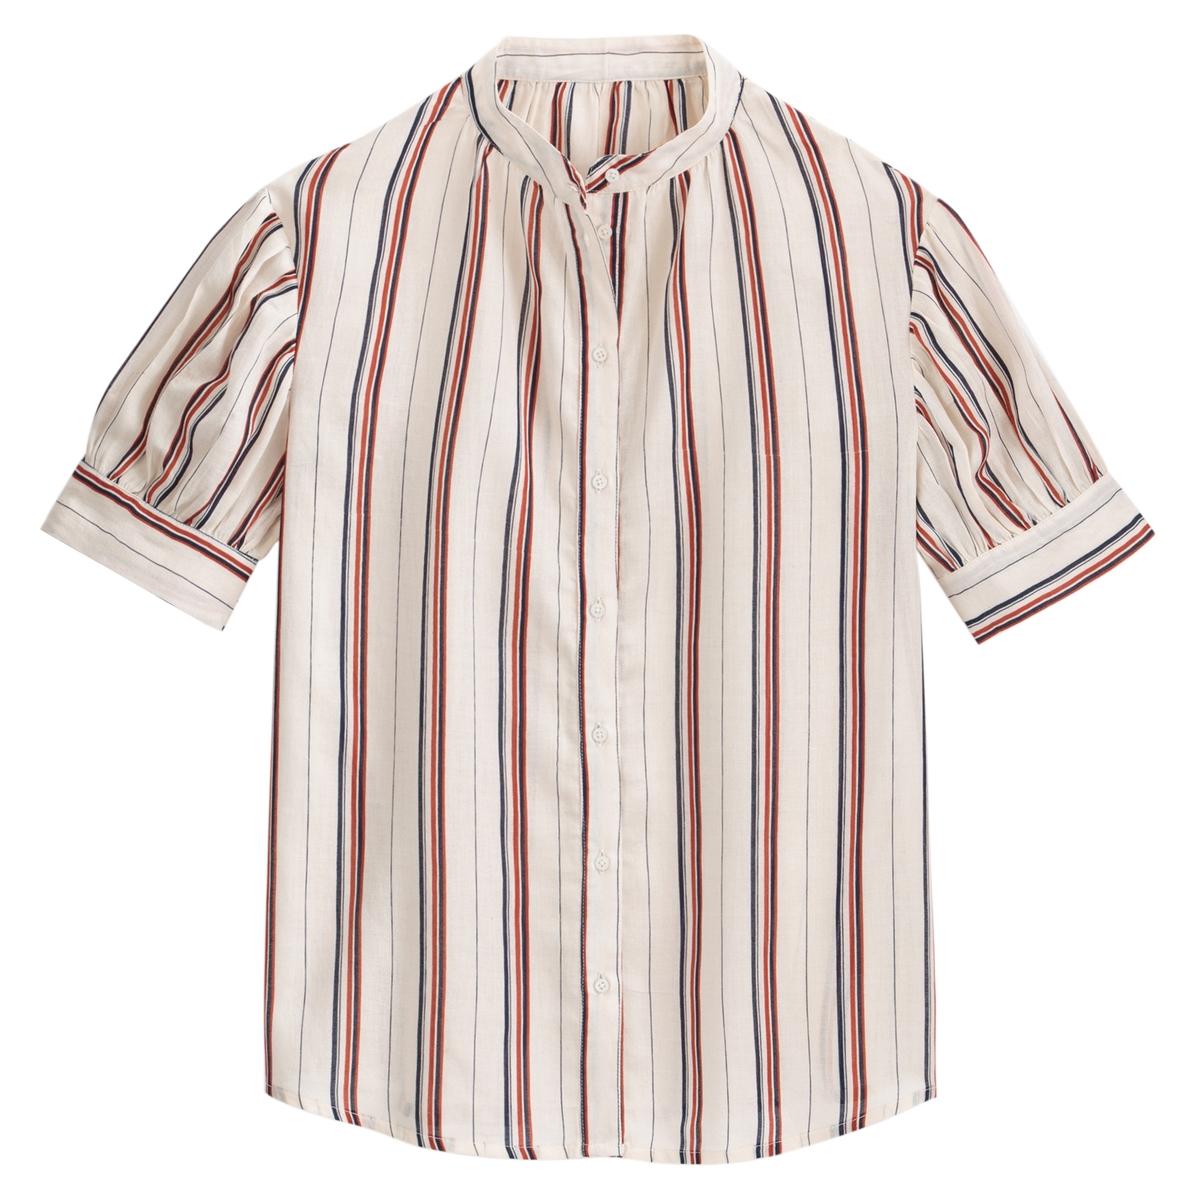 Camisa a rayas con cuello Mao, de manga corta